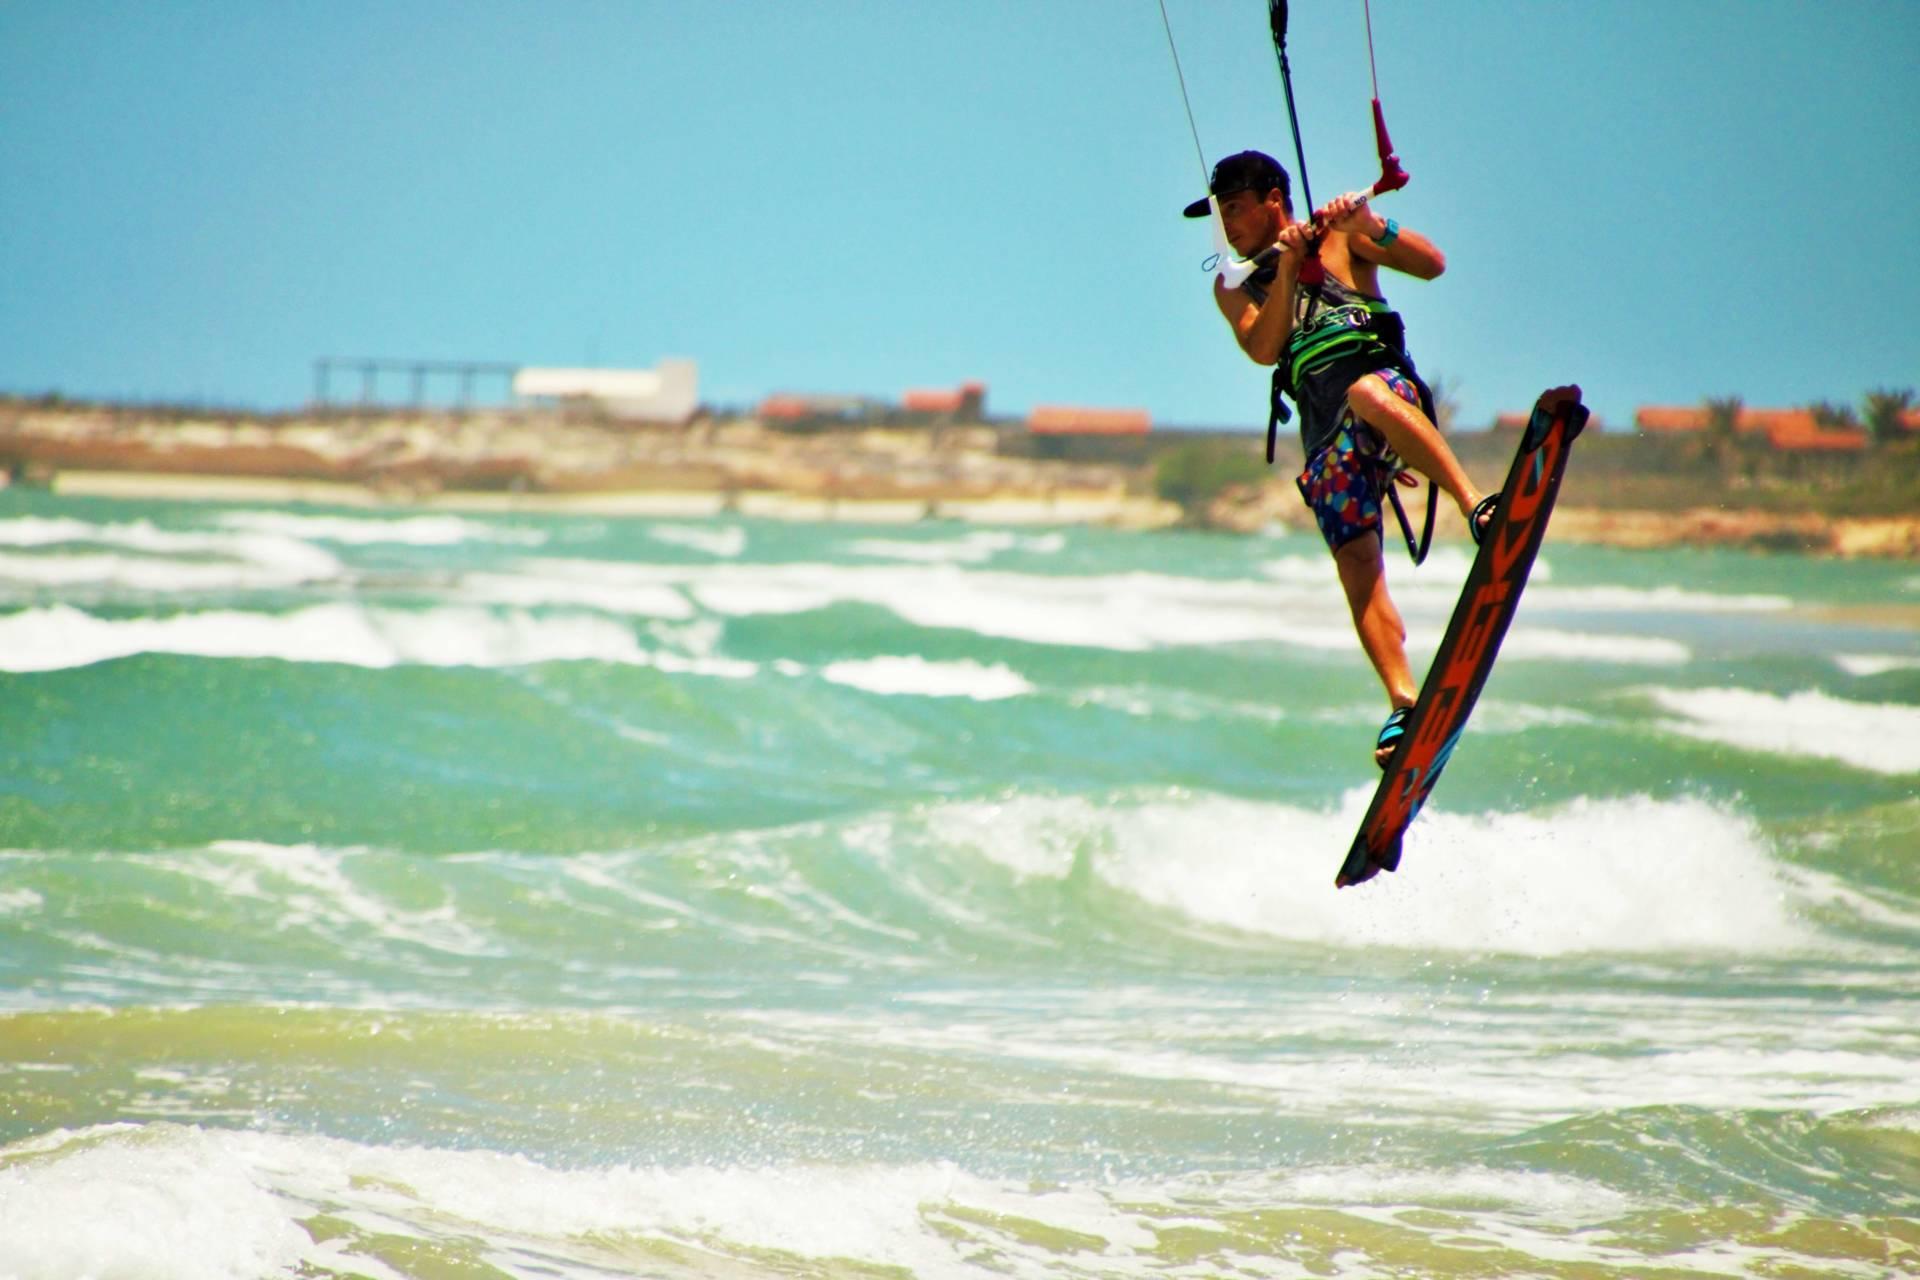 Pontal de maceio kiteboarding